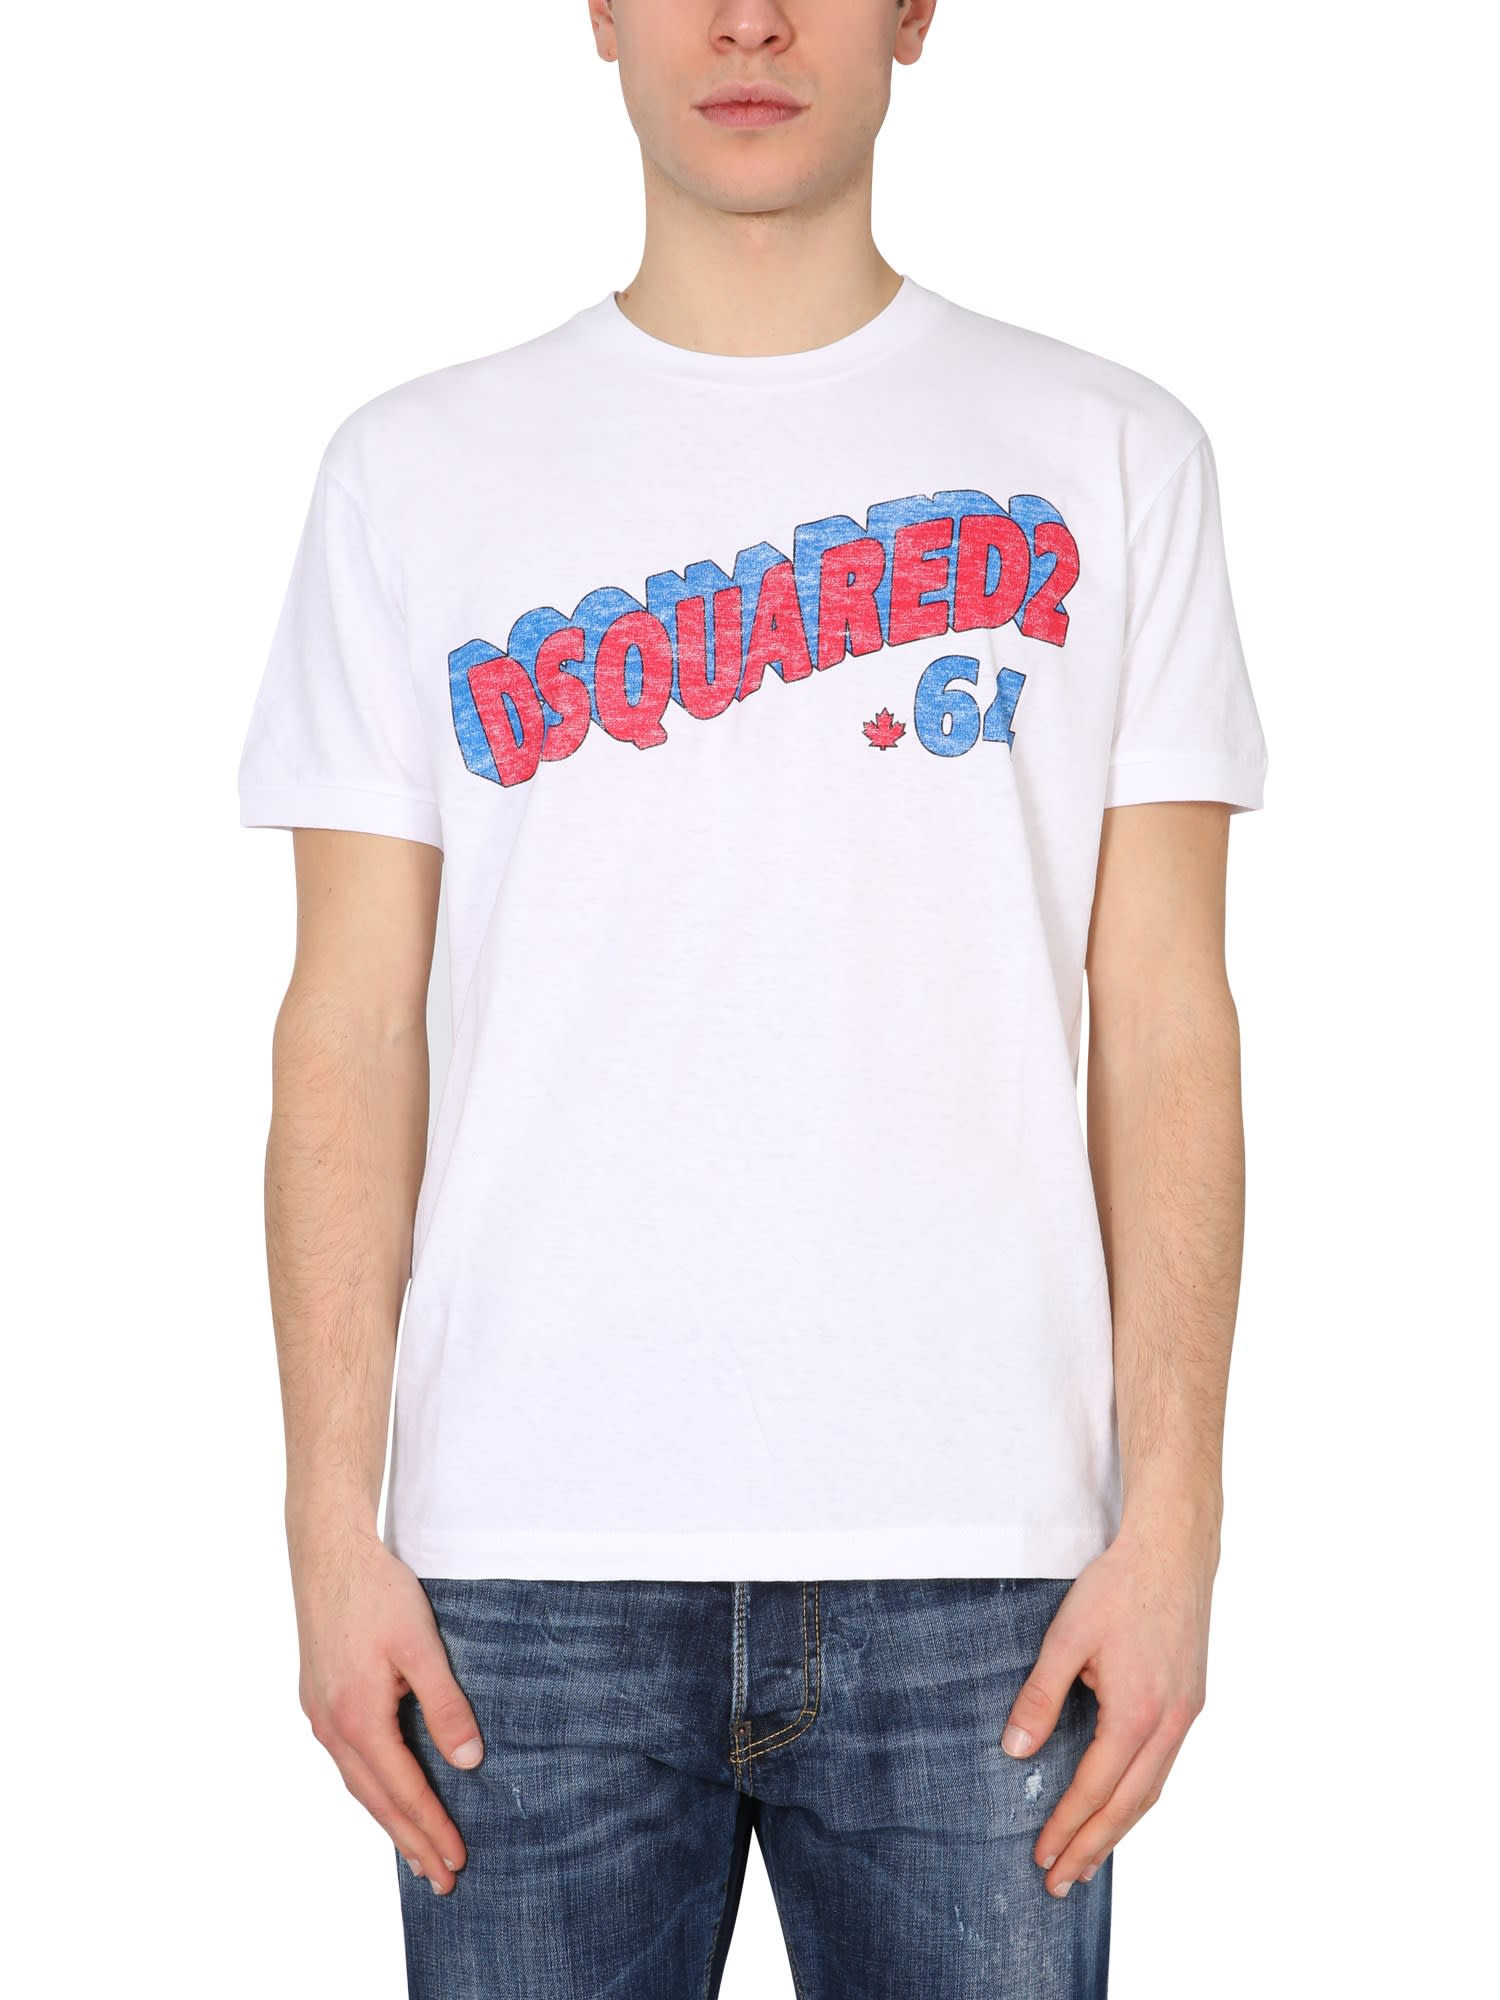 Dsquared2 T-shirts RETRO 64 T-SHIRT